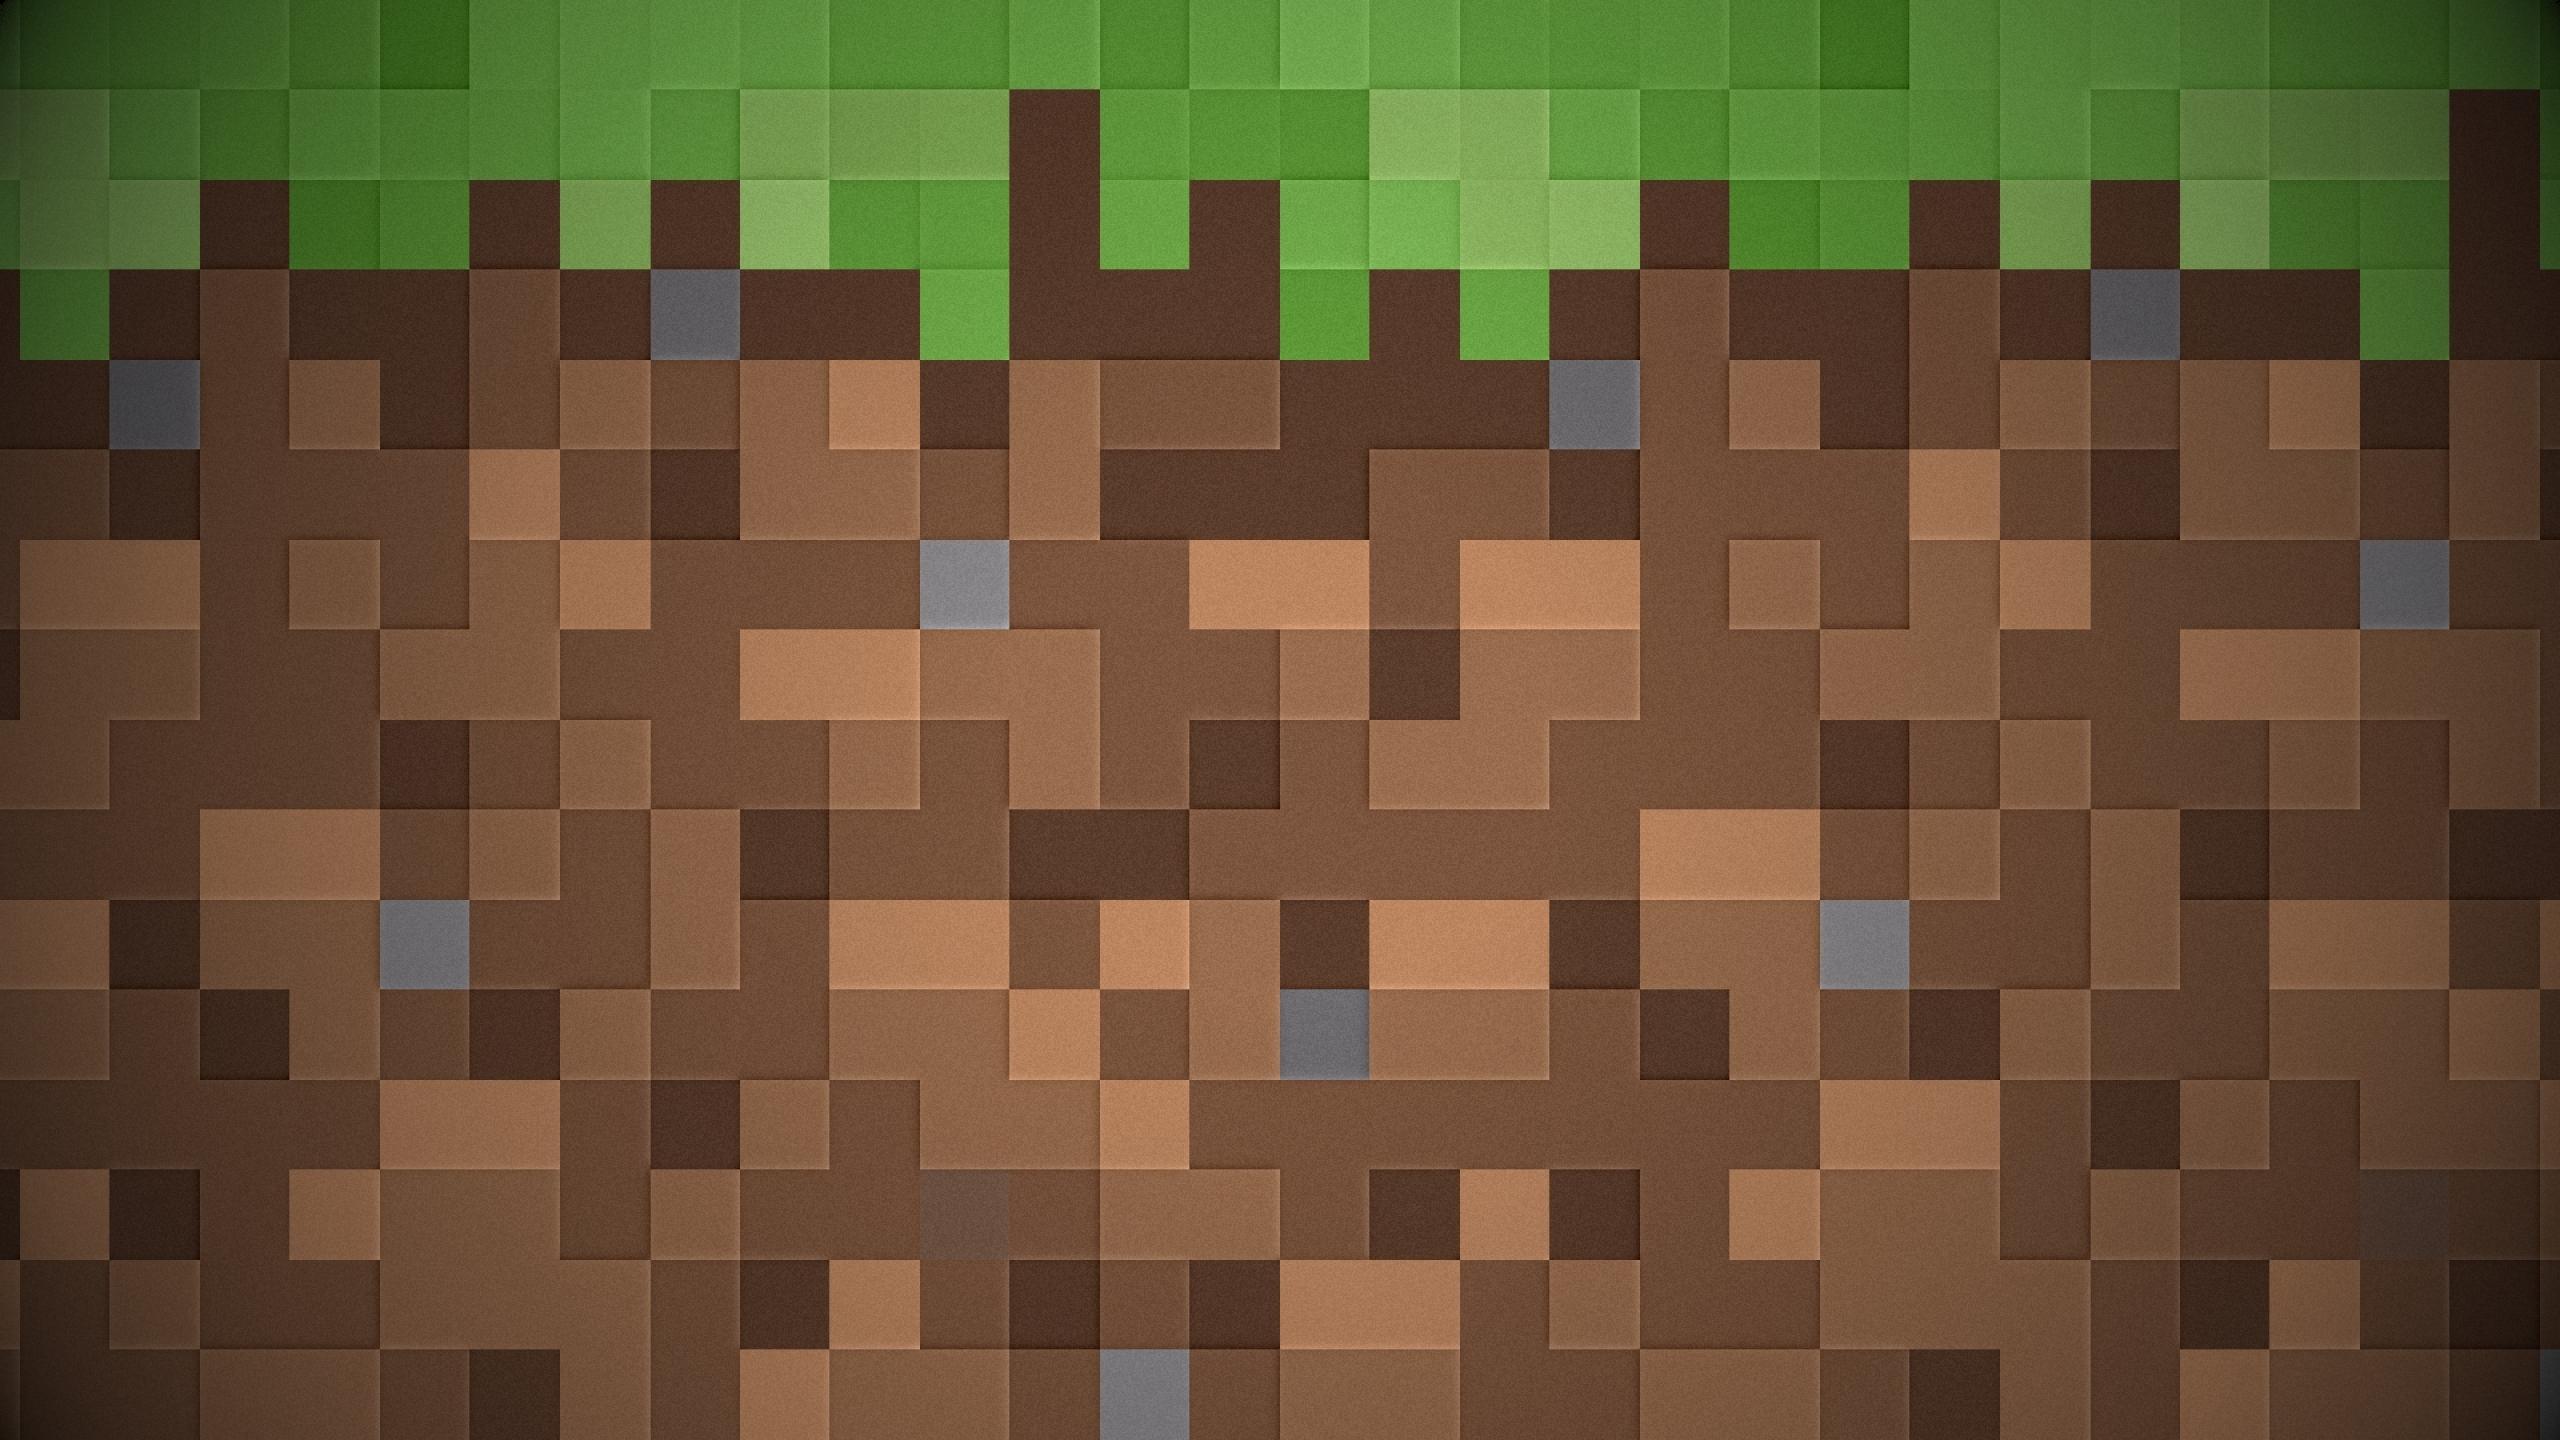 pixels dirt minecraft 1920x1080 wallpaper Miscellaneous HD Wallpaper 2560x1440